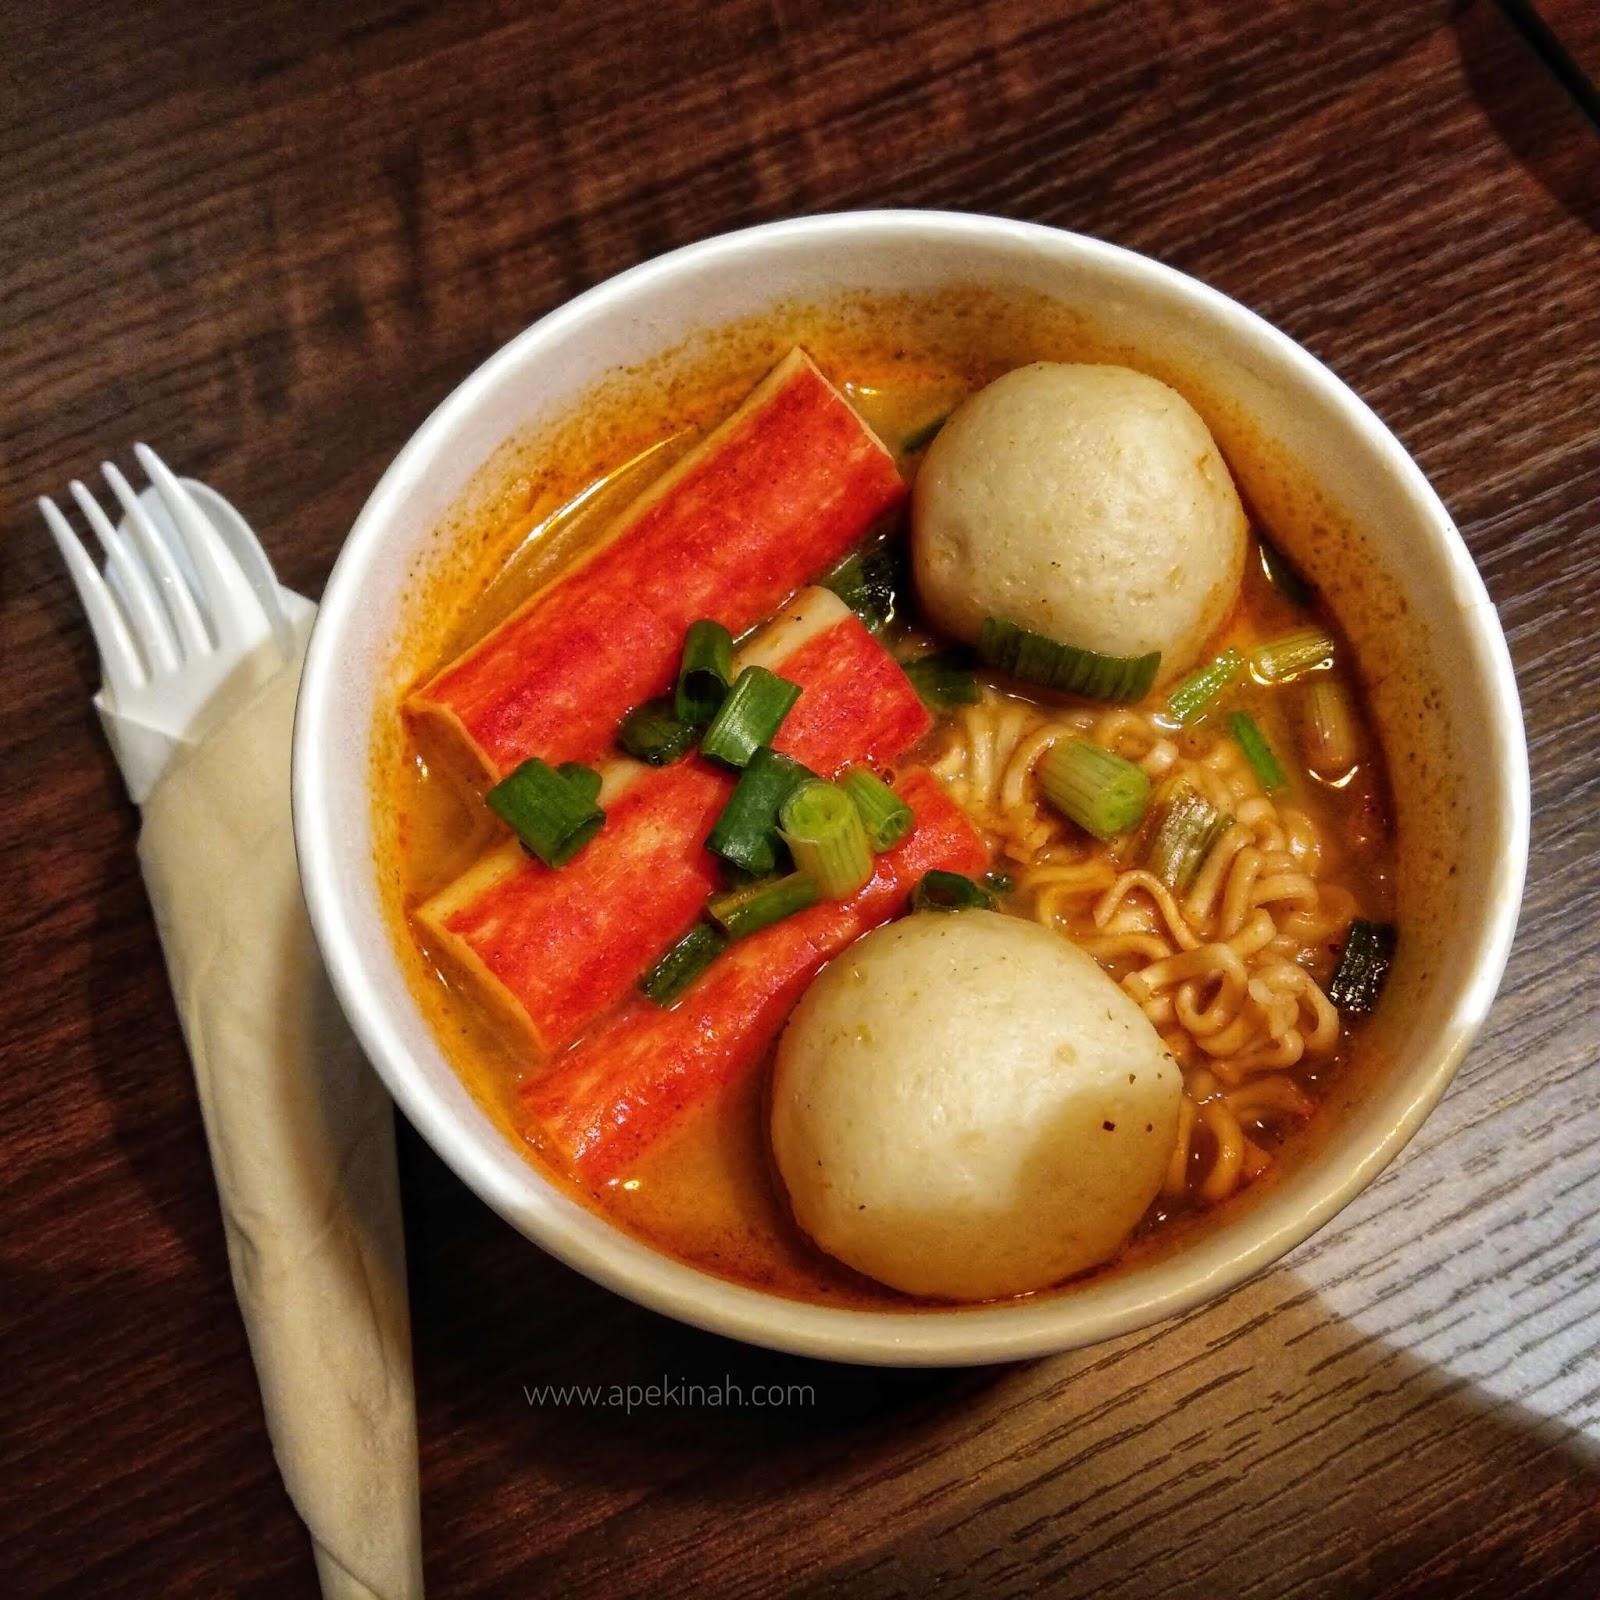 Chapayom, Chapayom Malaysia, Chapayom Thai Street Food, Chapayom I City Shah Alam